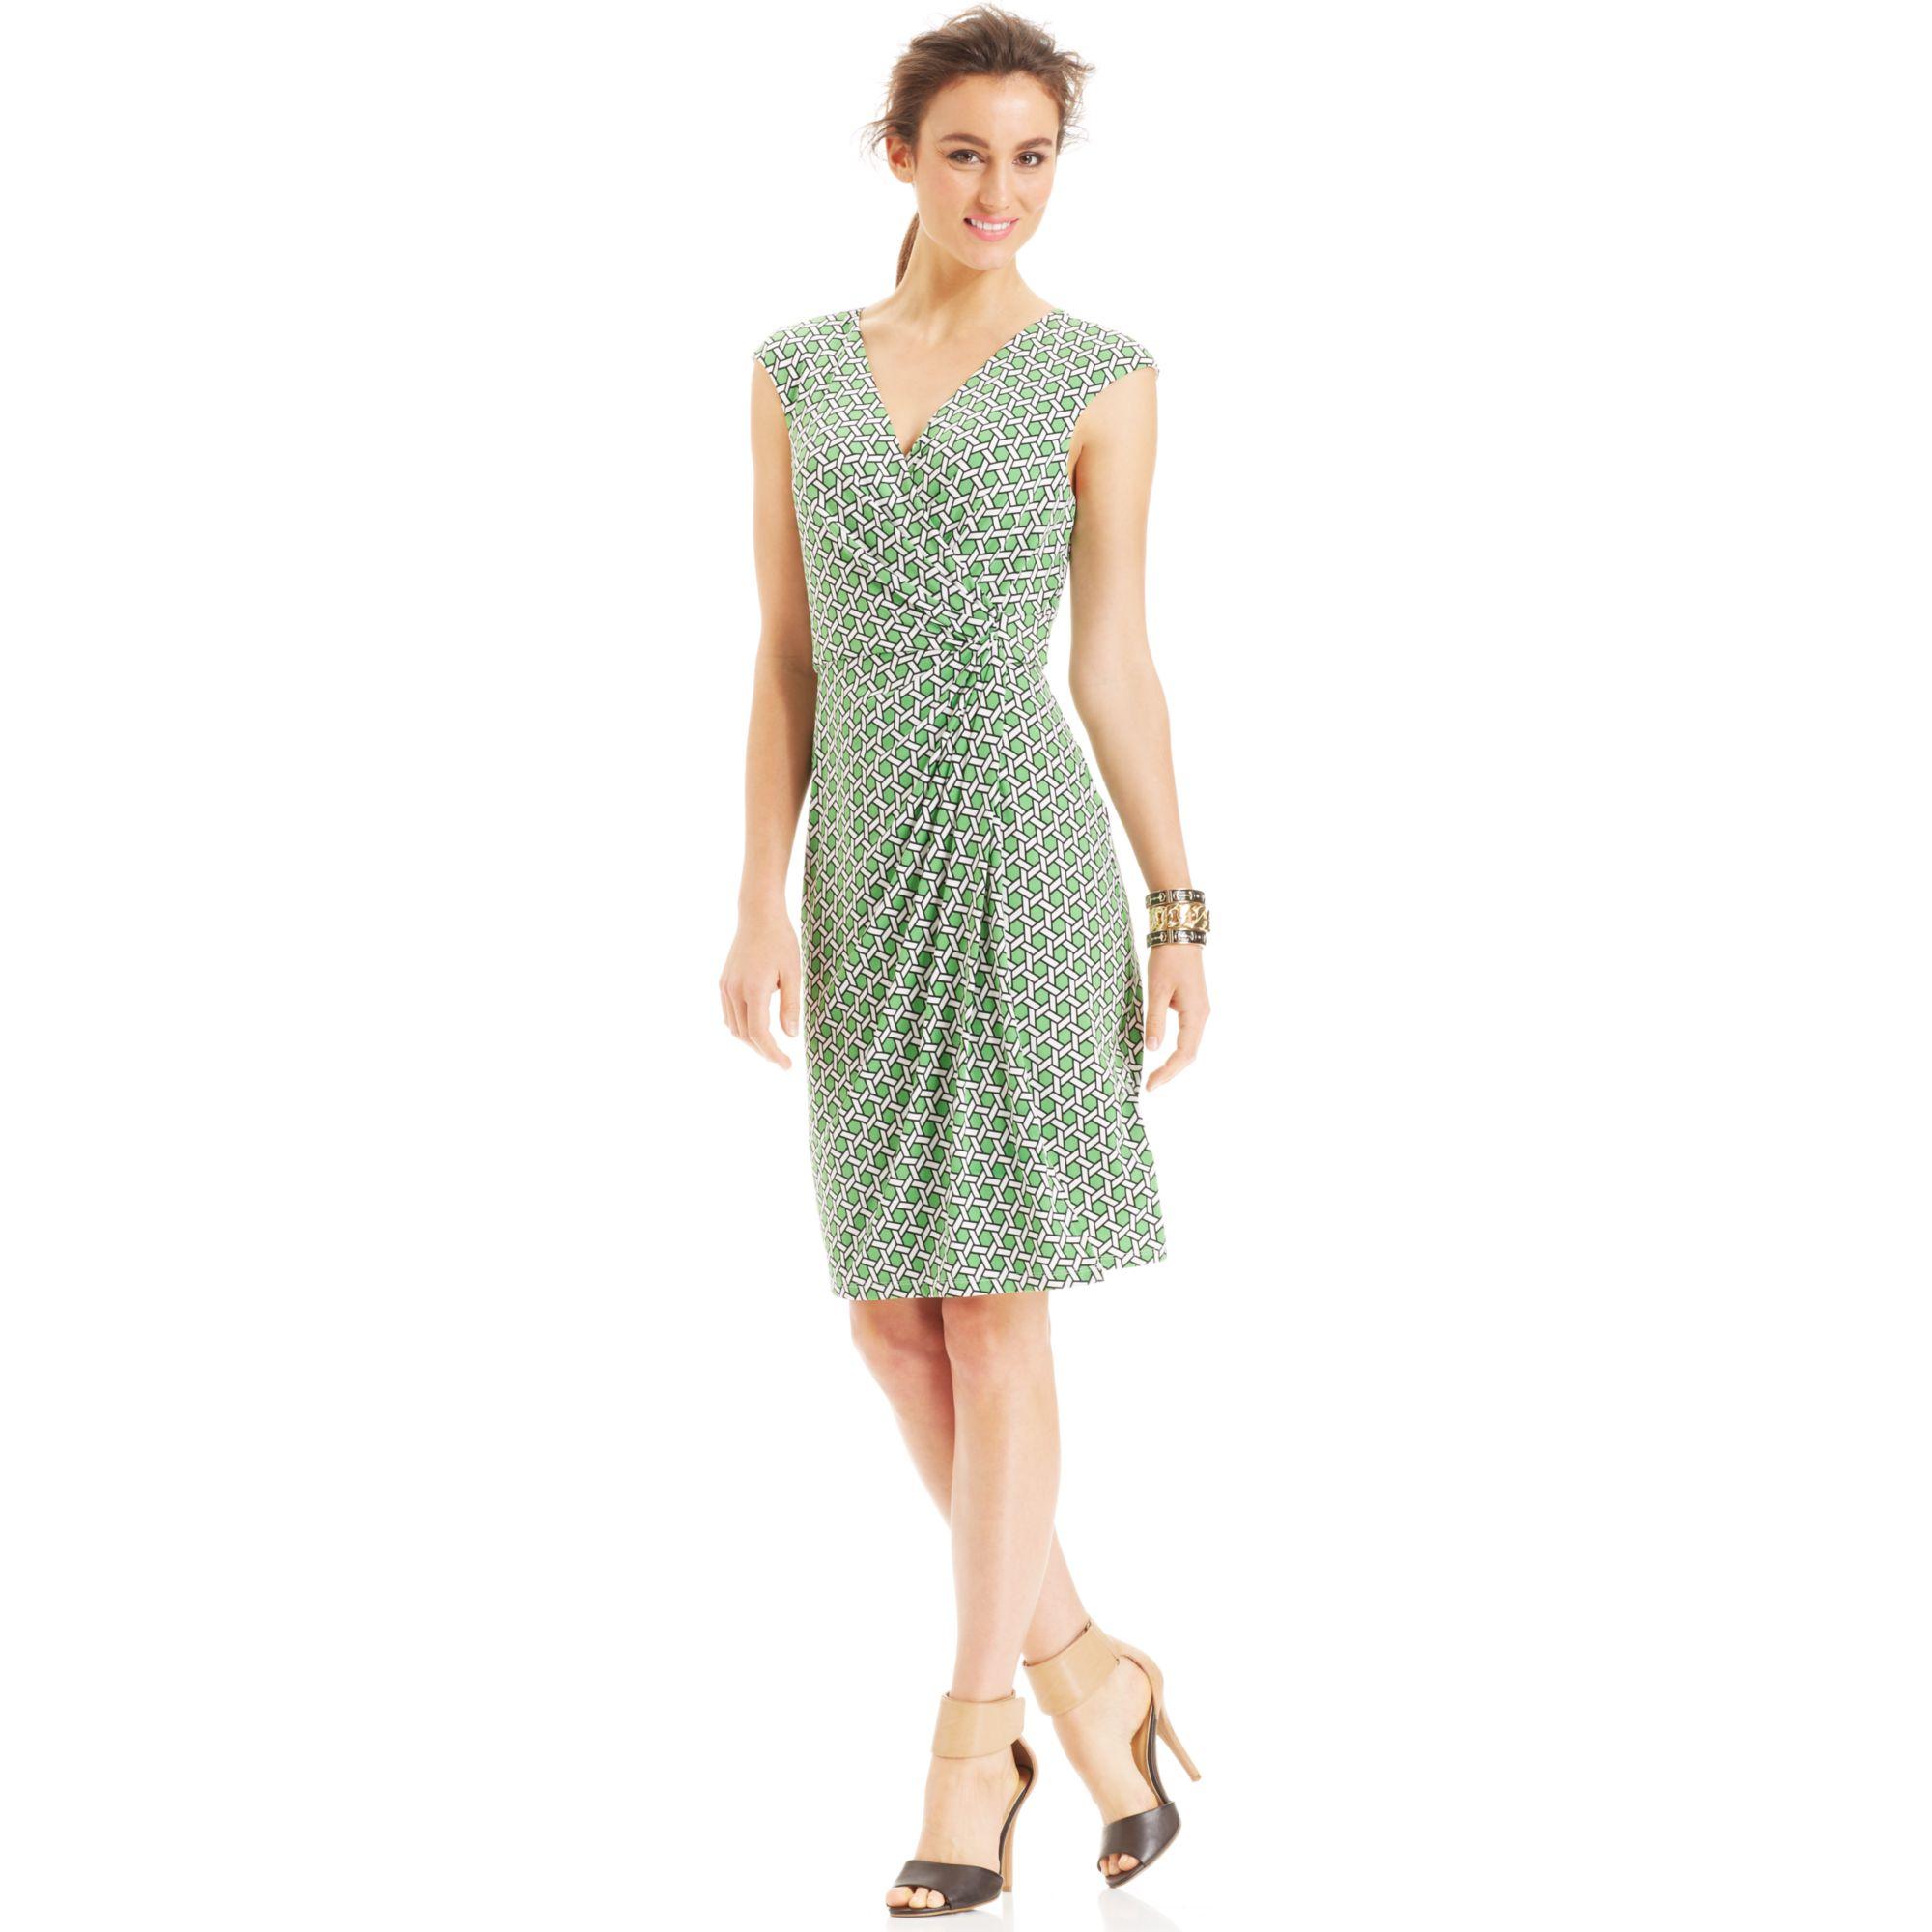 Lyst - Maggy London Capsleeve Geoprint Fauxwrap Dress in Green